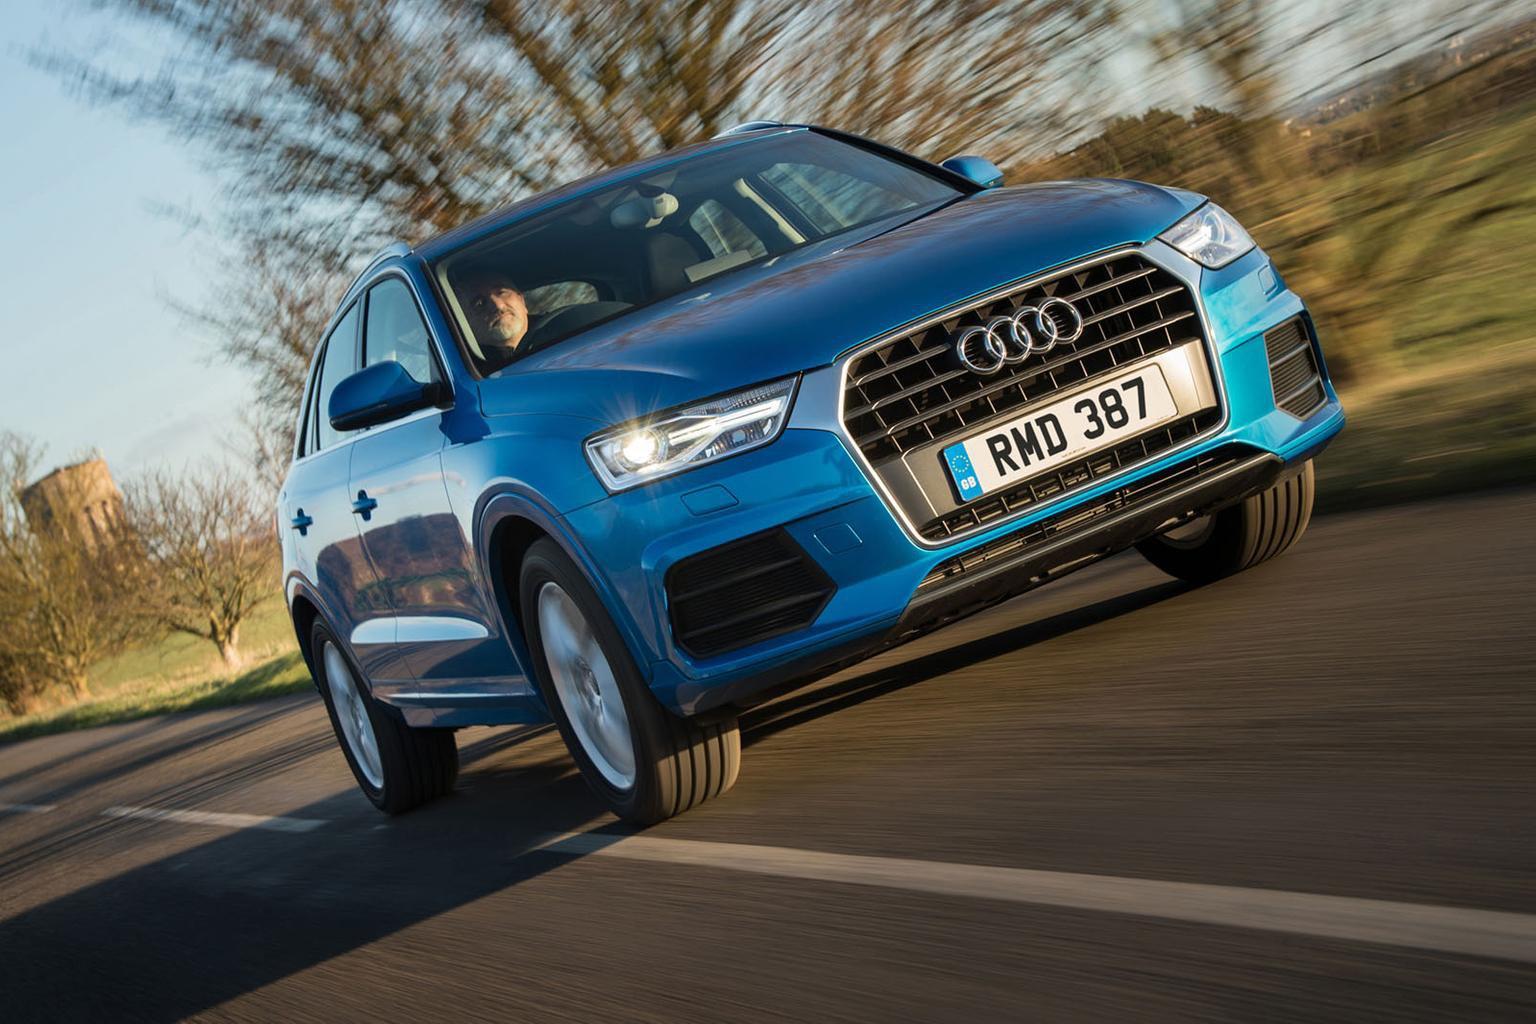 2015 Audi Q3 1.4 TFSI review